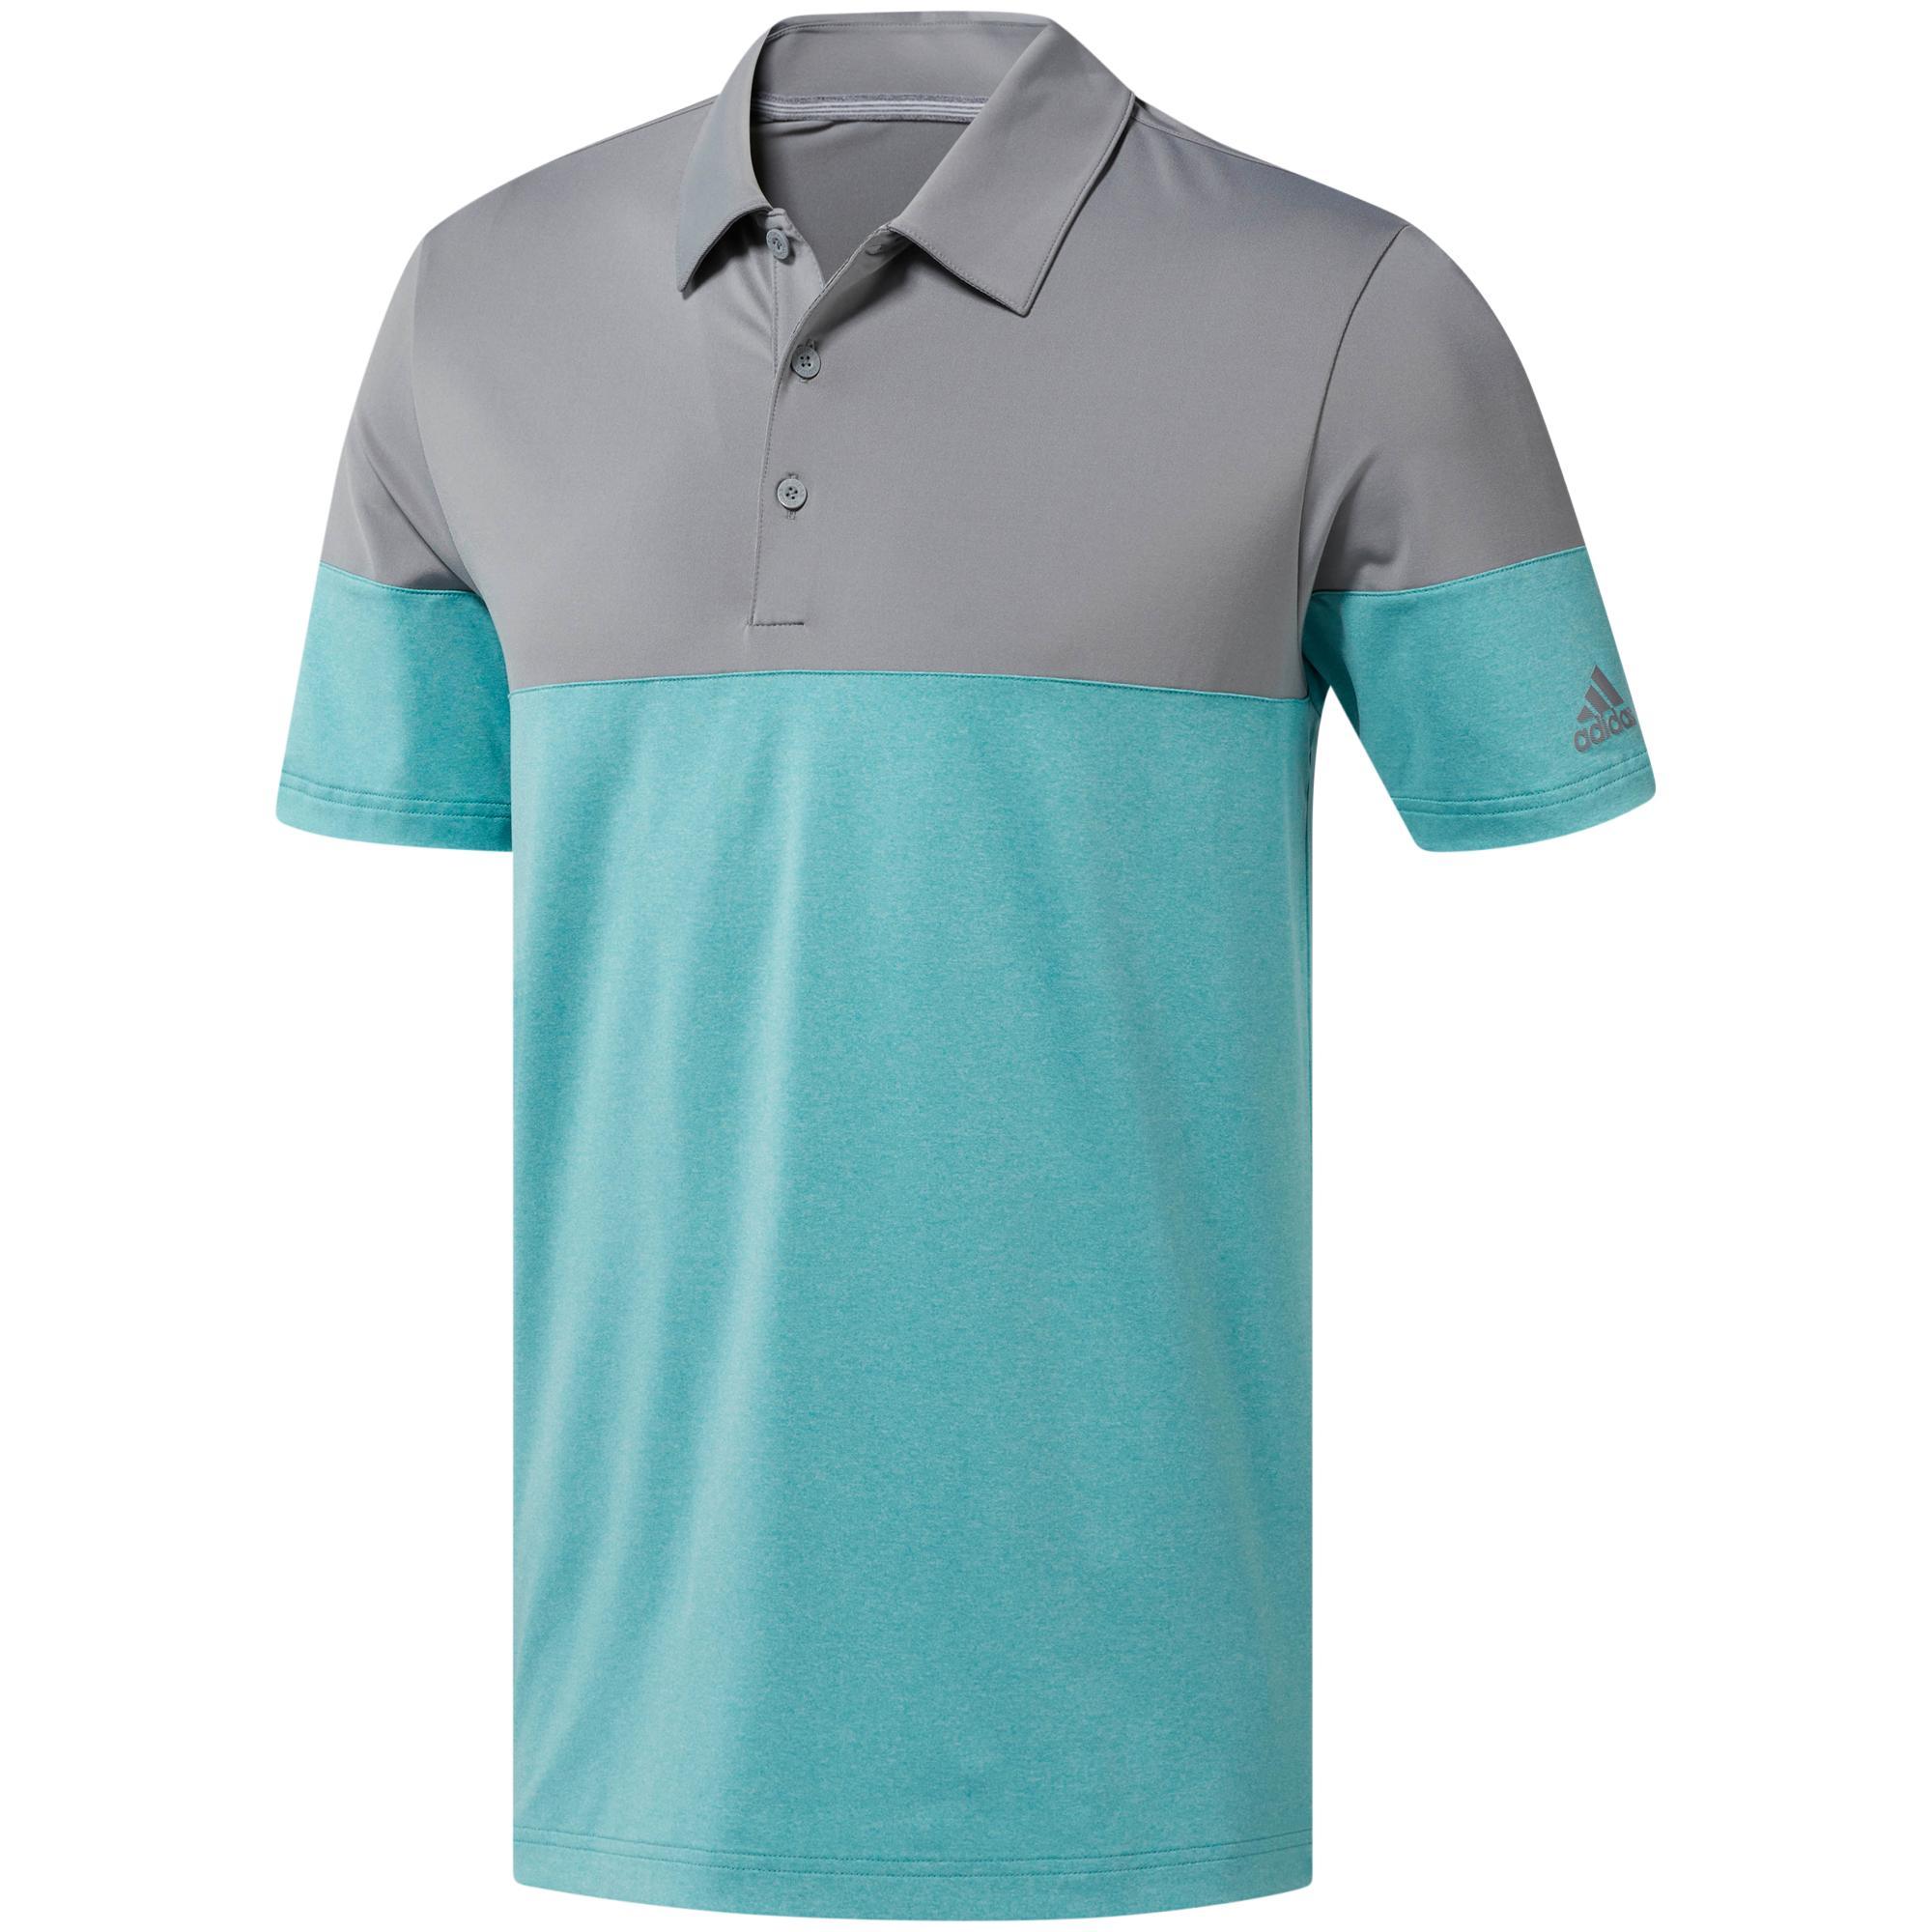 Men's Ultimate 365 Heather Blocked Short Sleeve Shirt